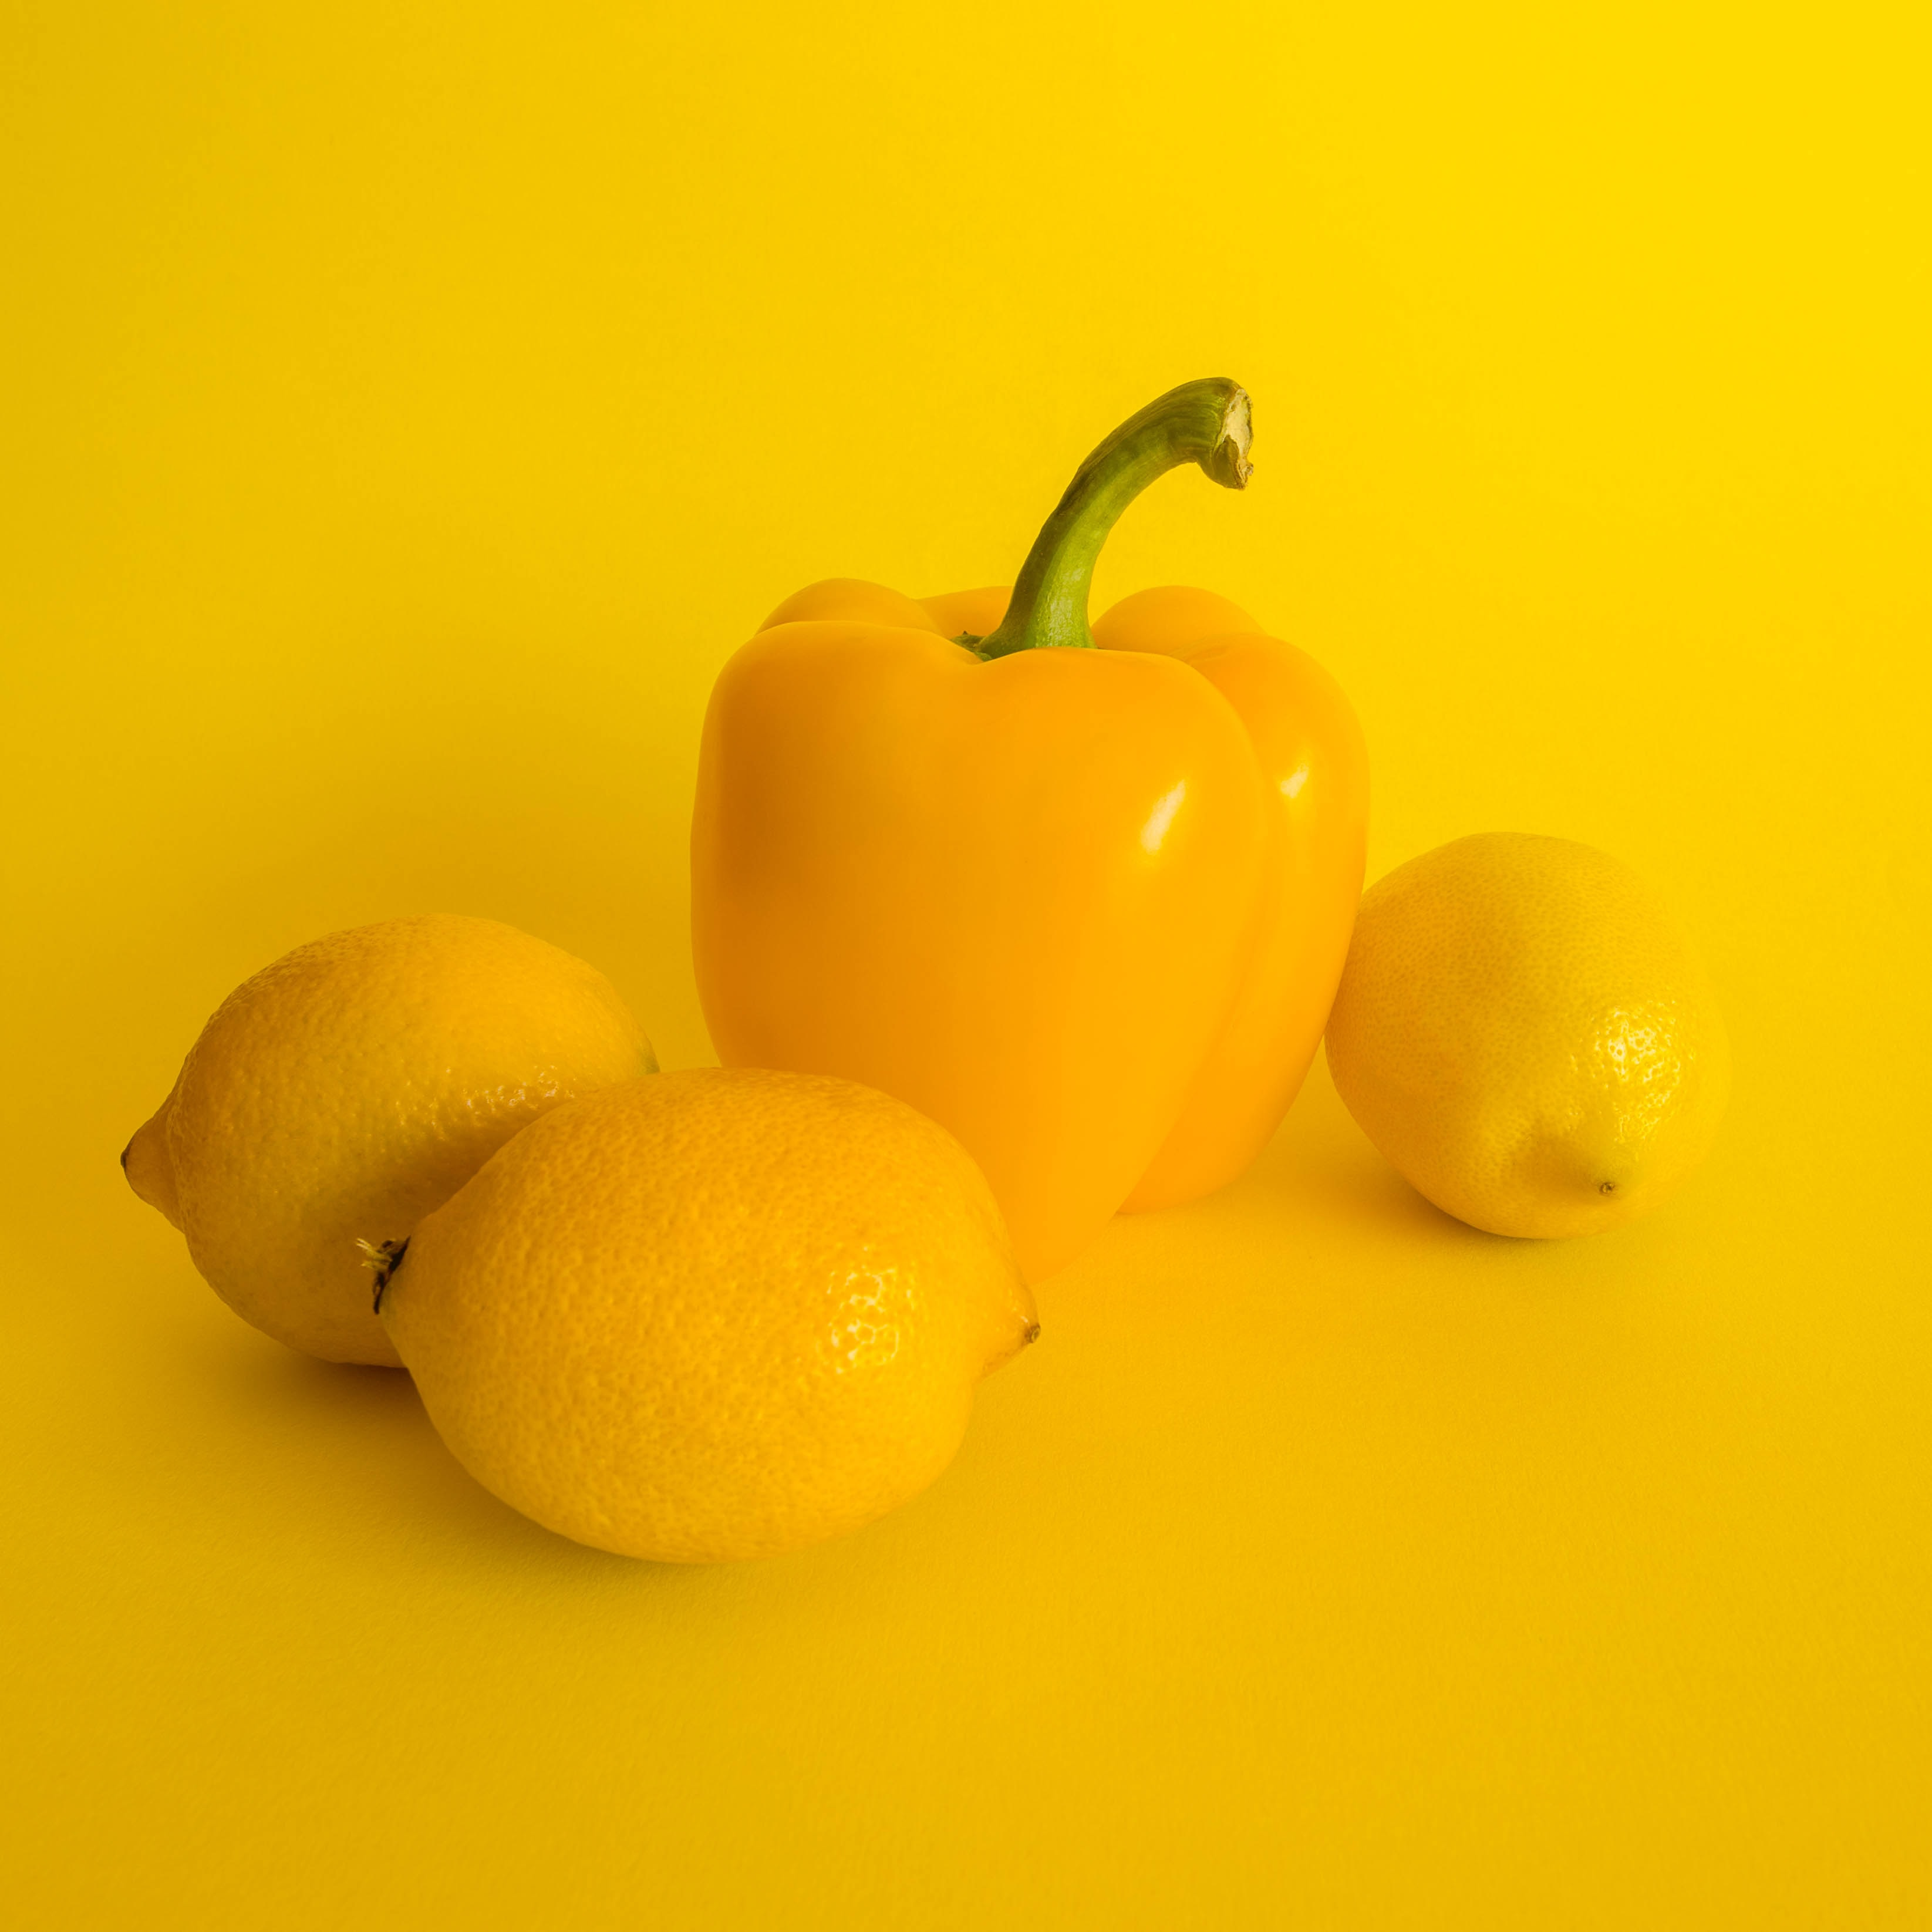 three lemons and yellow bell pepper